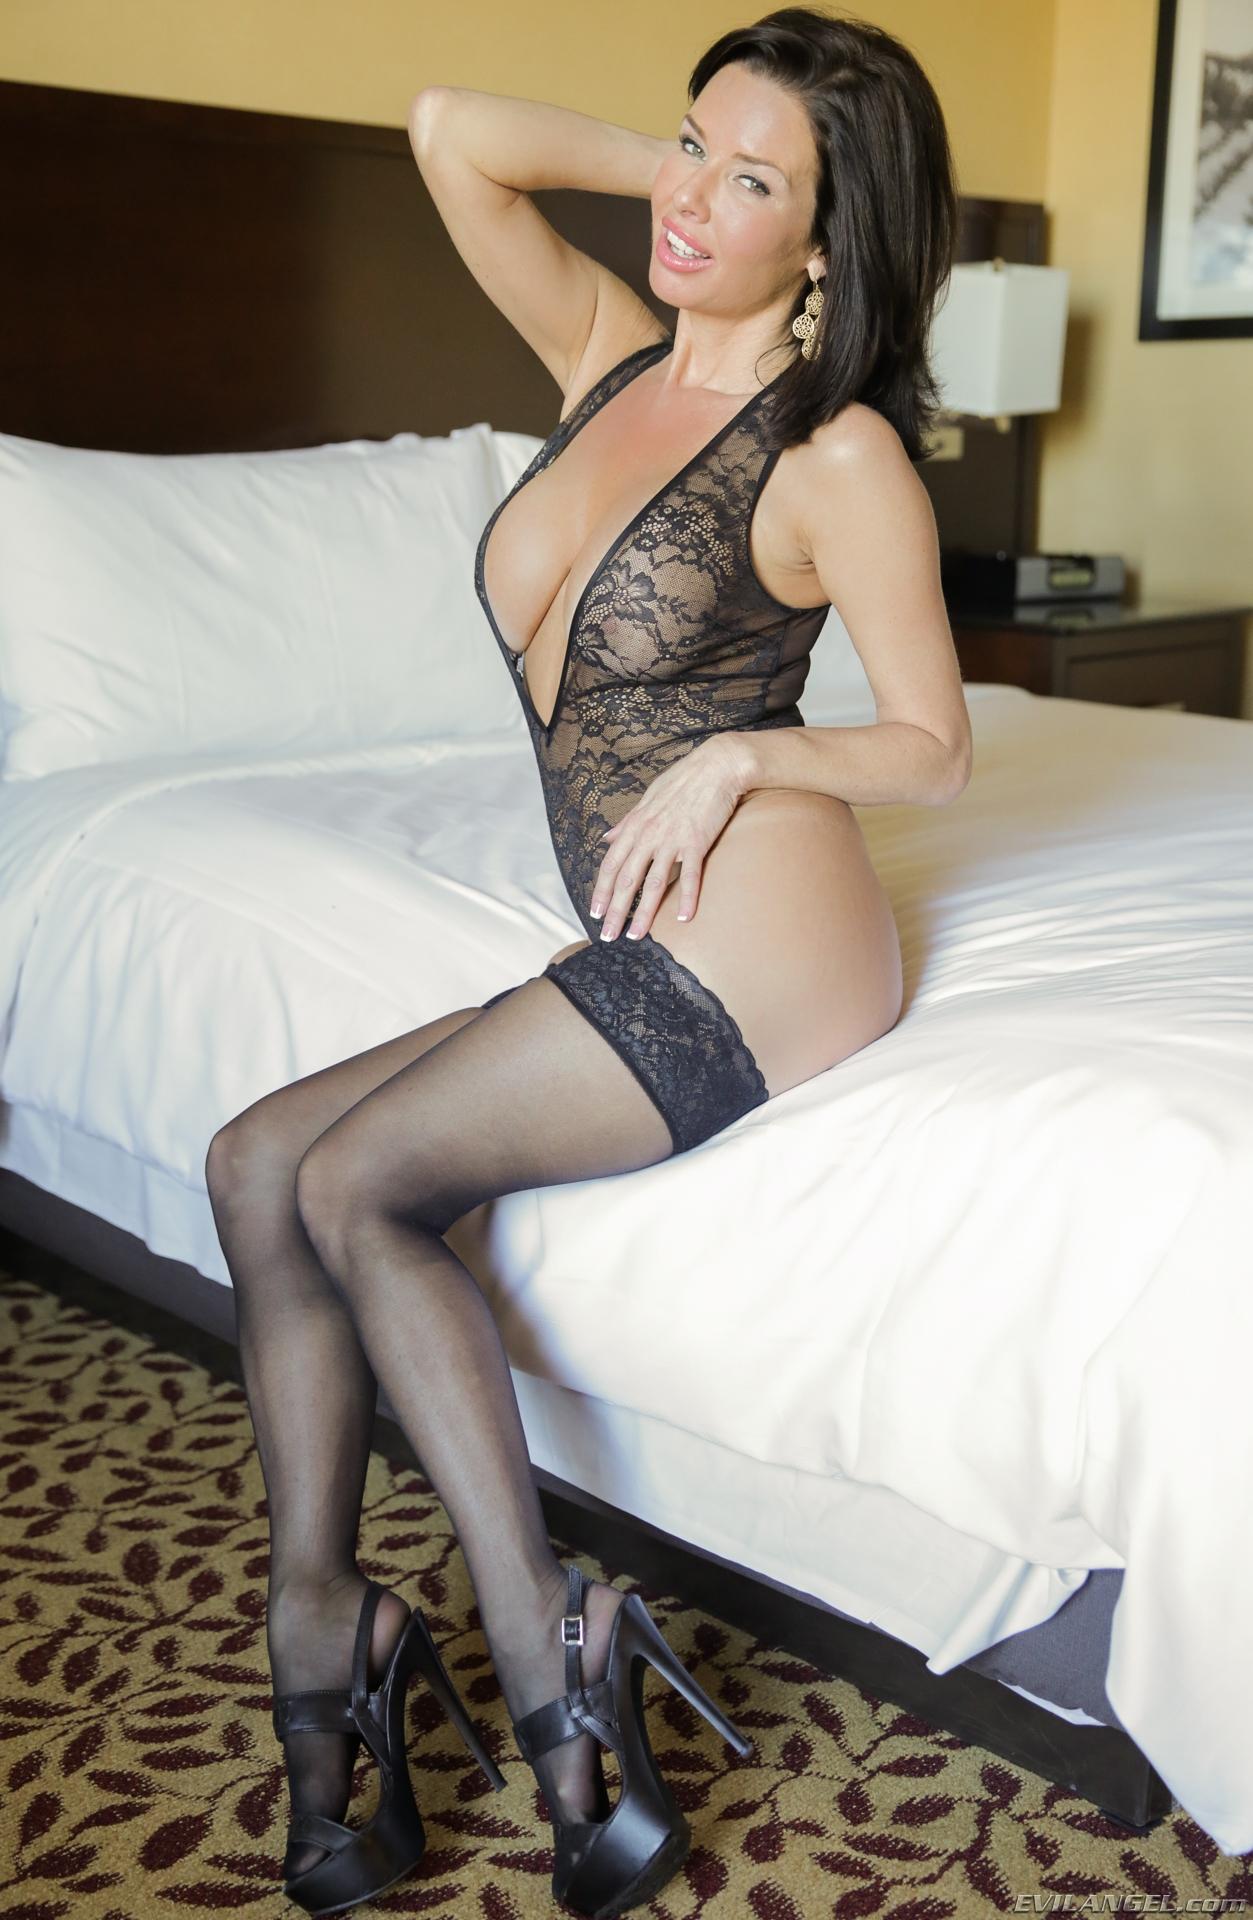 shaved-busty-brunette-veronica-avluv-wearing-platform-high-heels-7.jpg